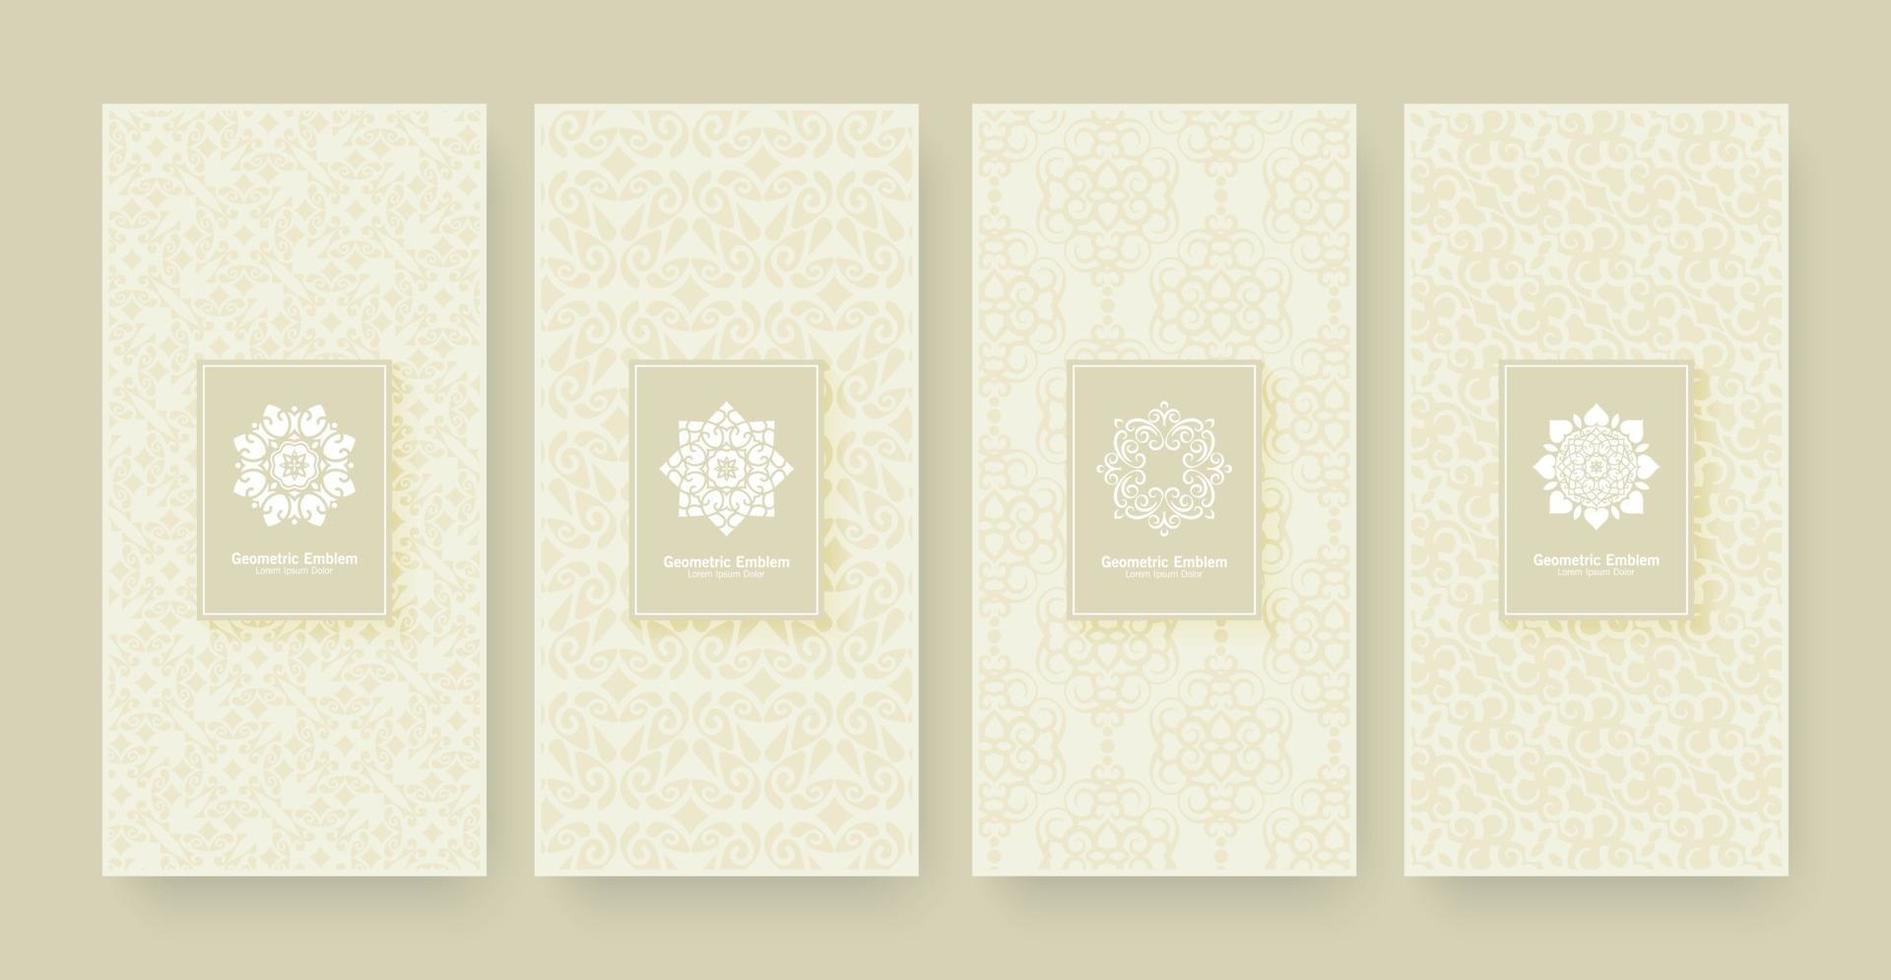 elegante banner ornament patroon ontwerp achtergrond vector